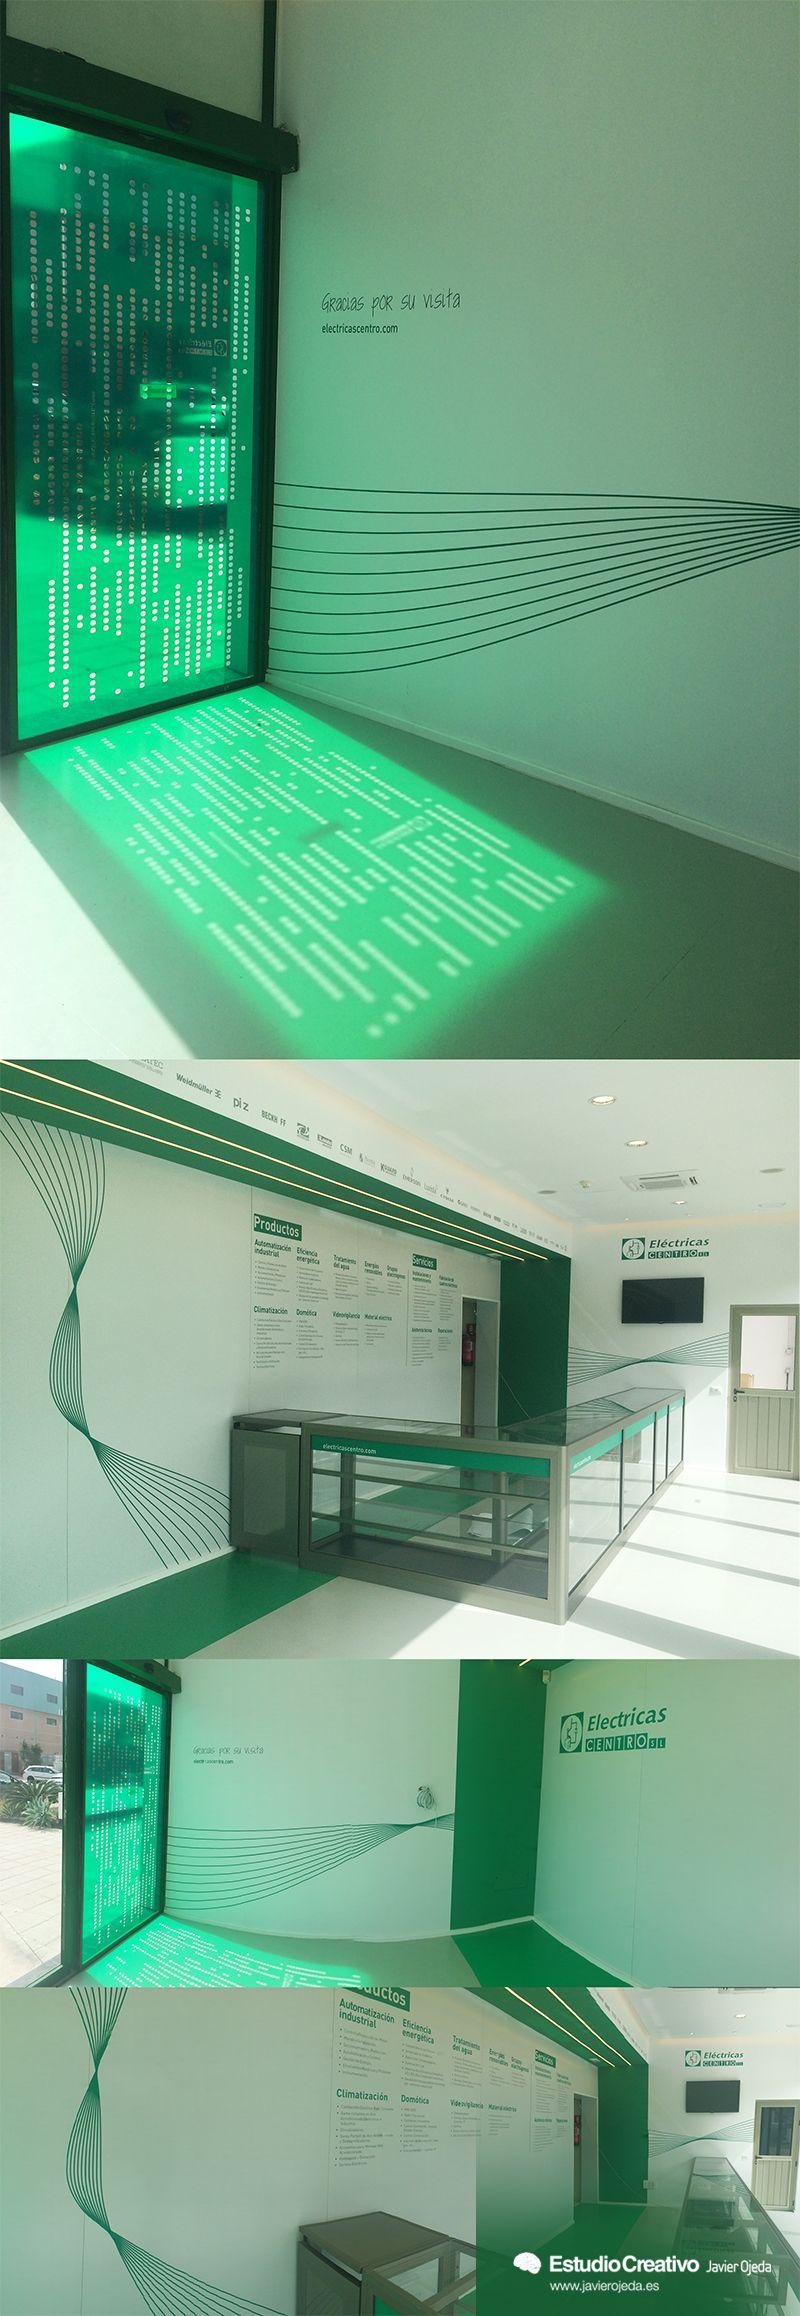 Diseño interior de tienda showroom  #interiordesign #enviromentaldesign